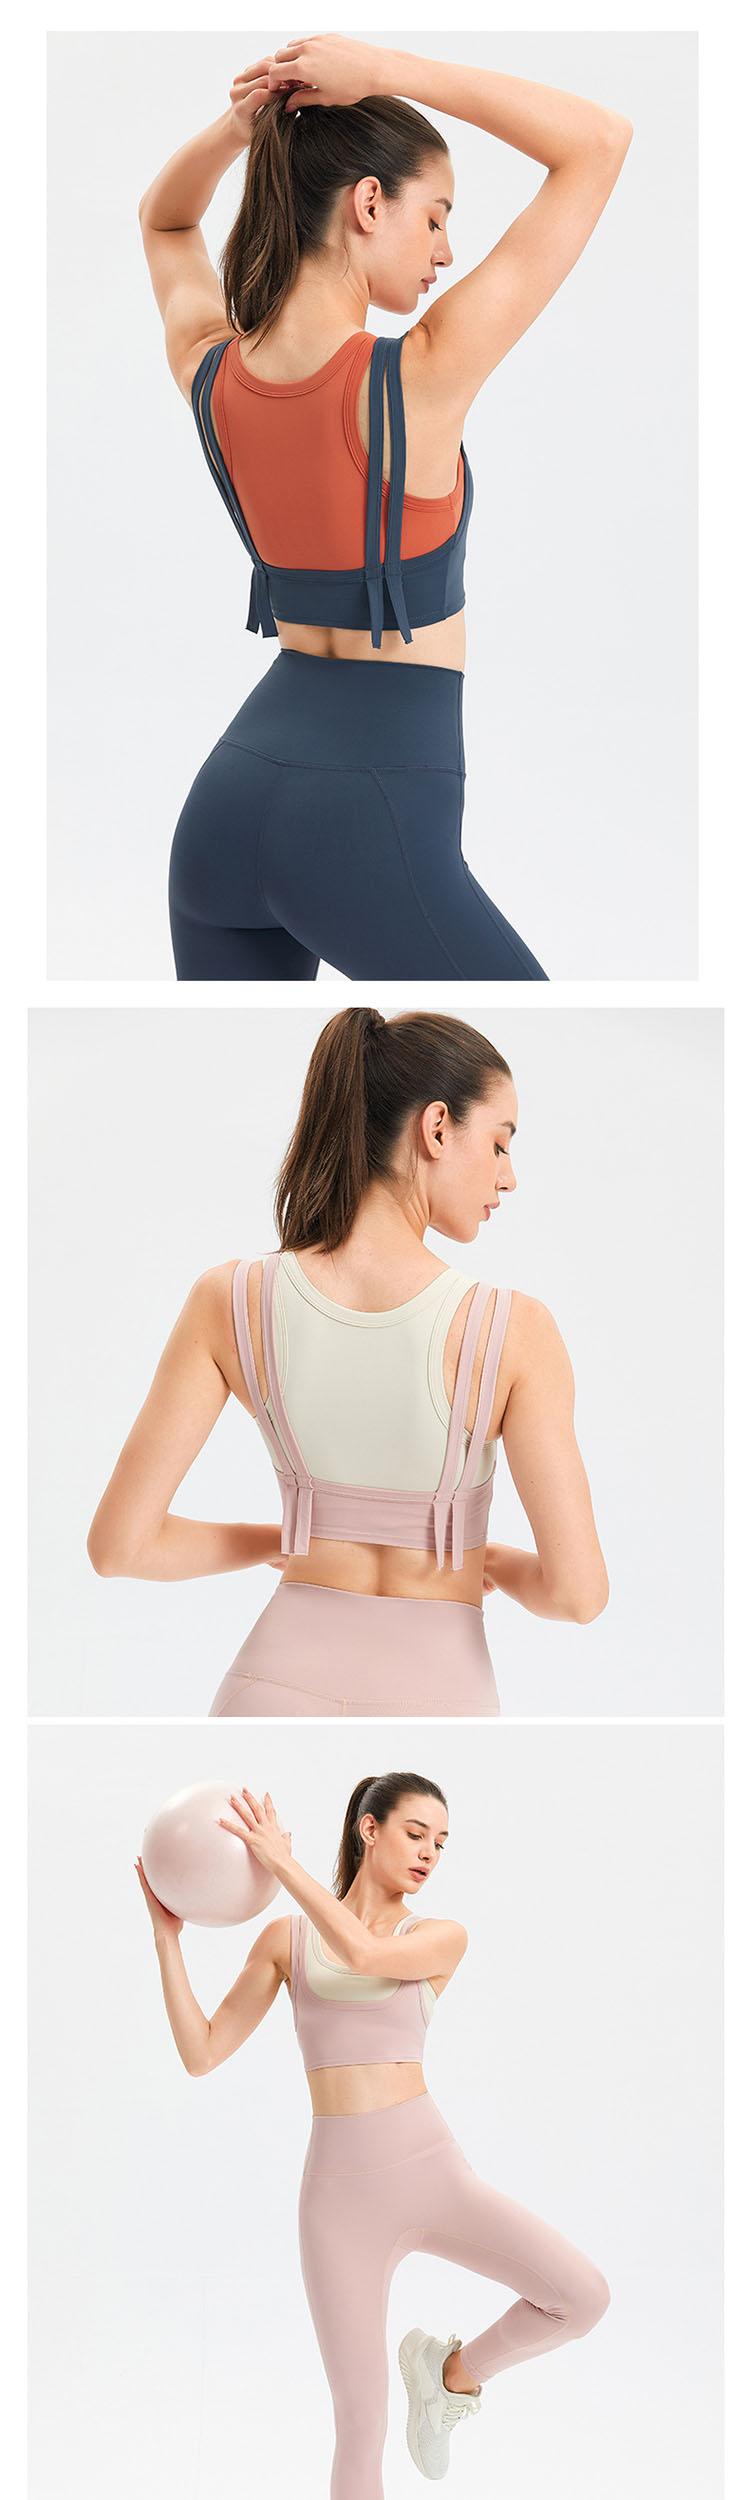 Double-layered shoulder straps, softly fit, disperse shoulder pressure during exercise.